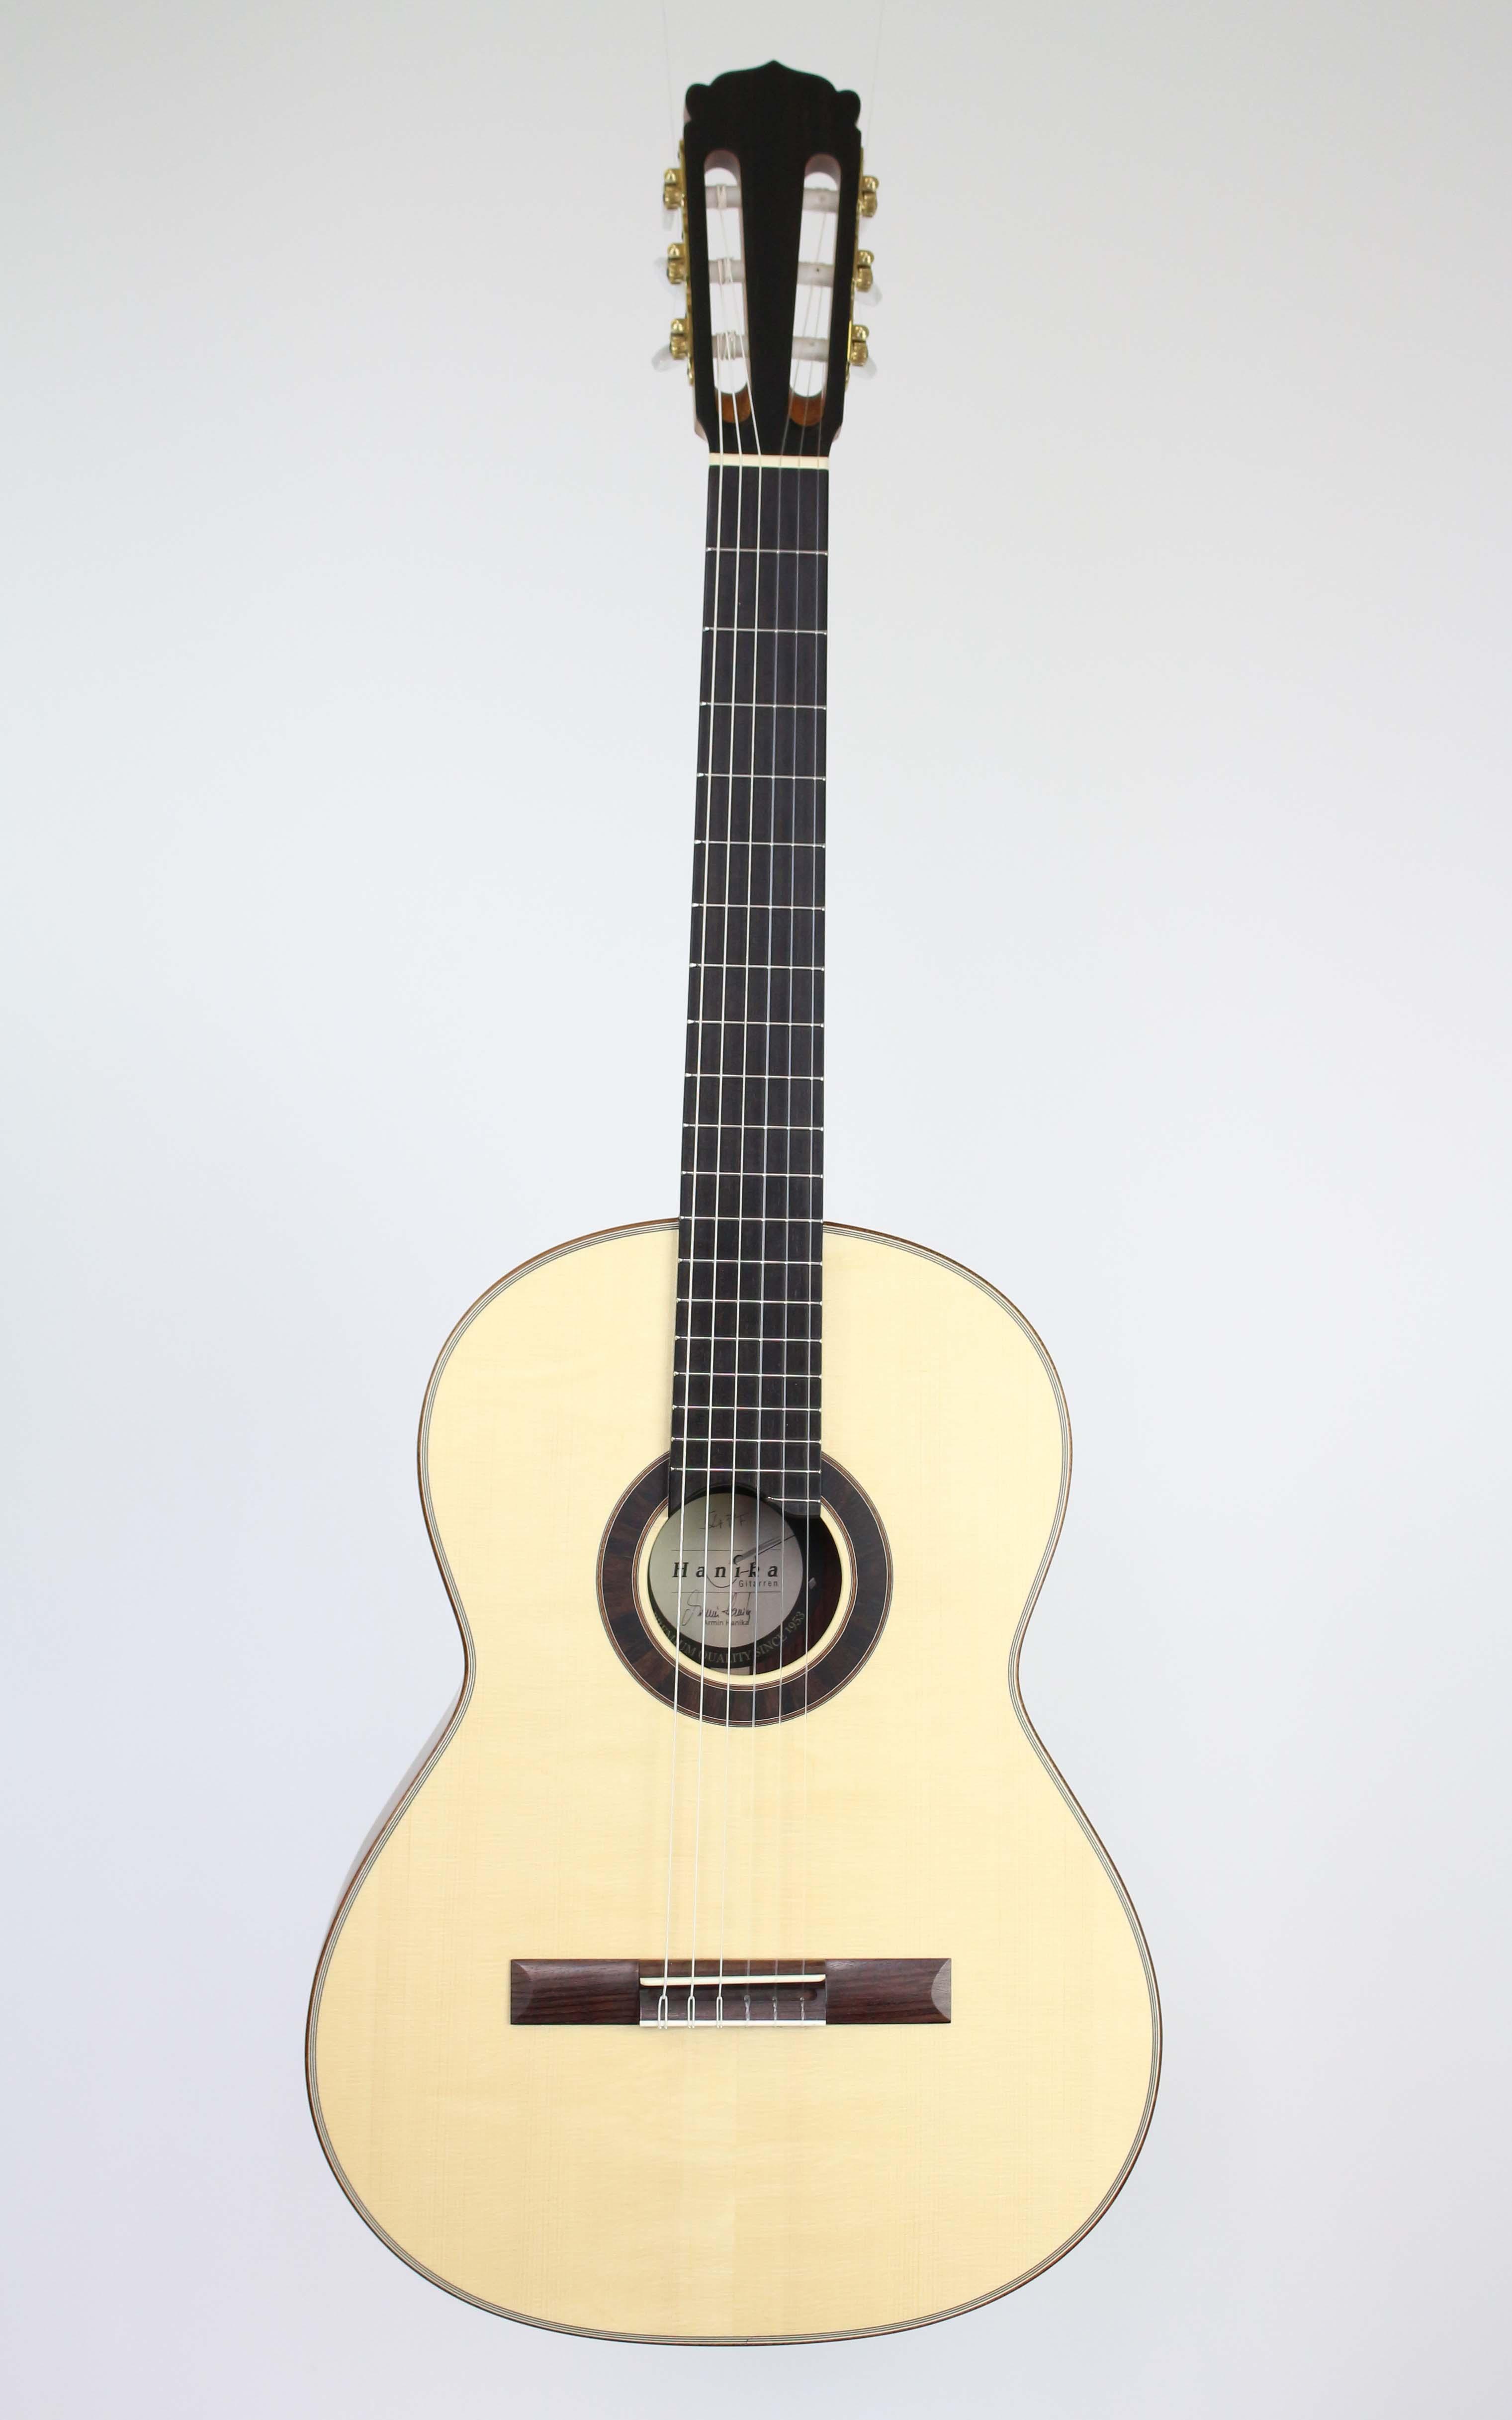 Hanika - 54 PF - Gitarren - Konzertgitarren | MUSIK BERTRAM Deutschland Freiburg